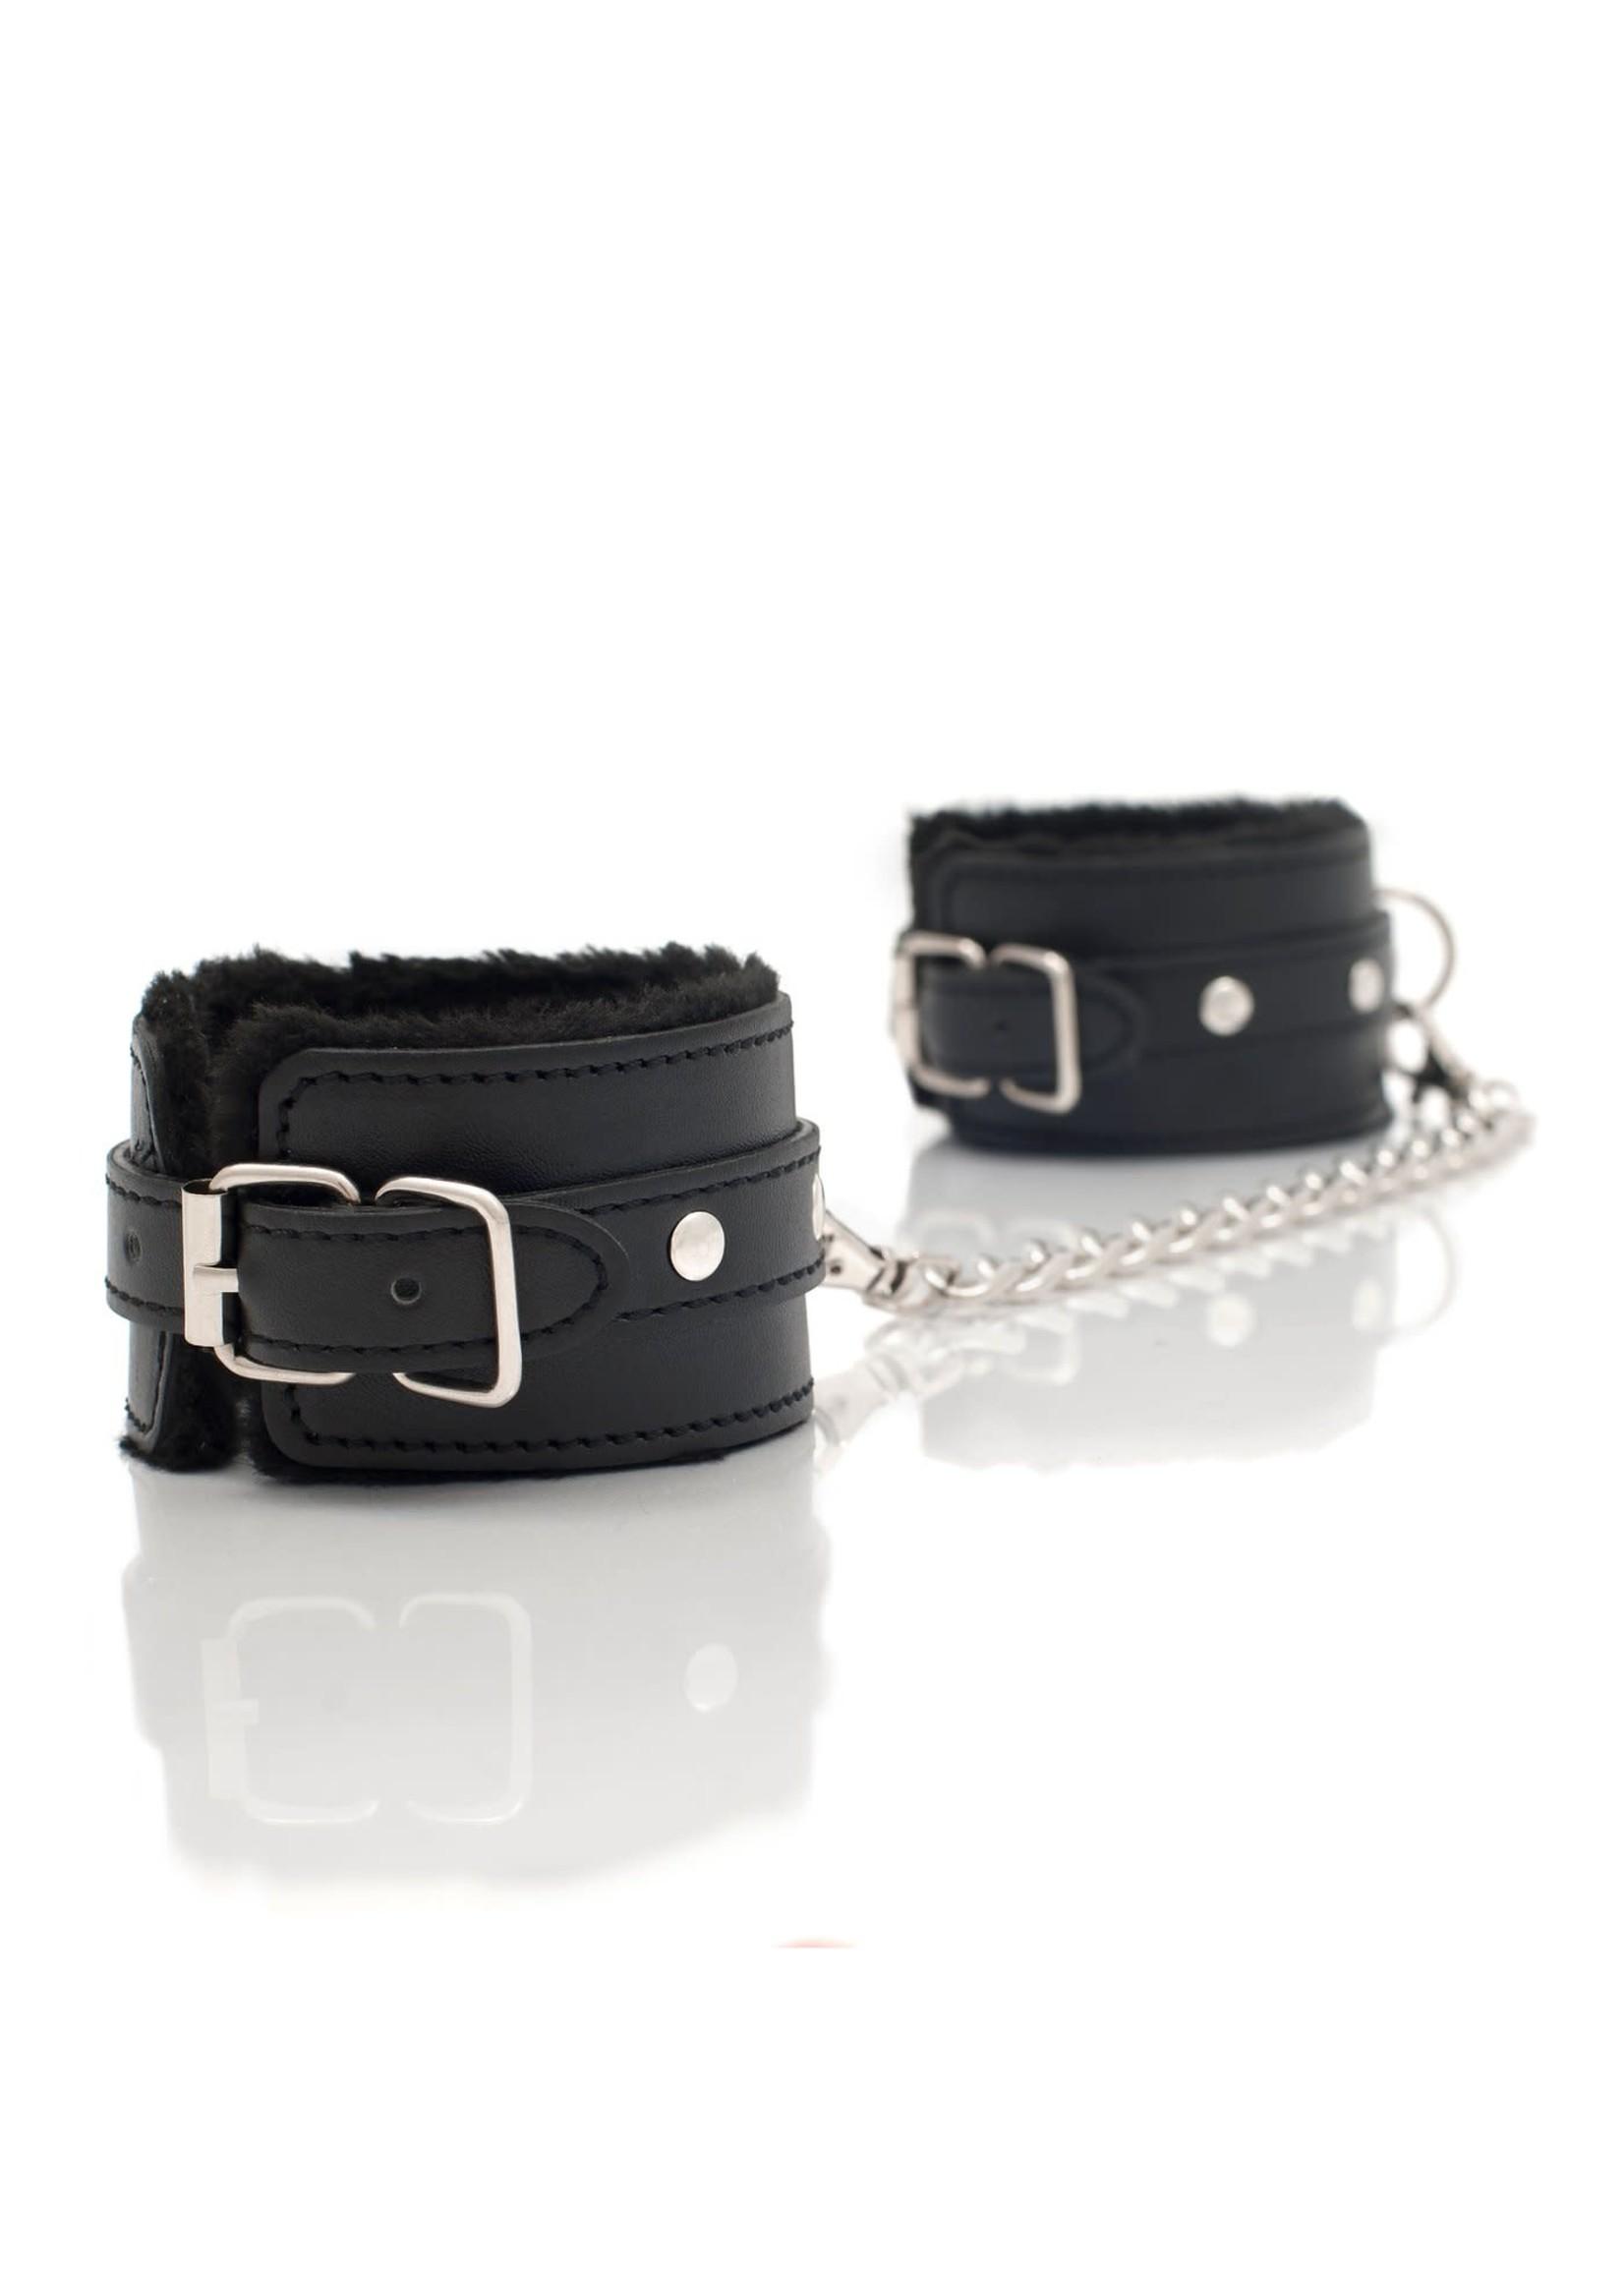 Deviant Deviant Risque Wrist Cuffs